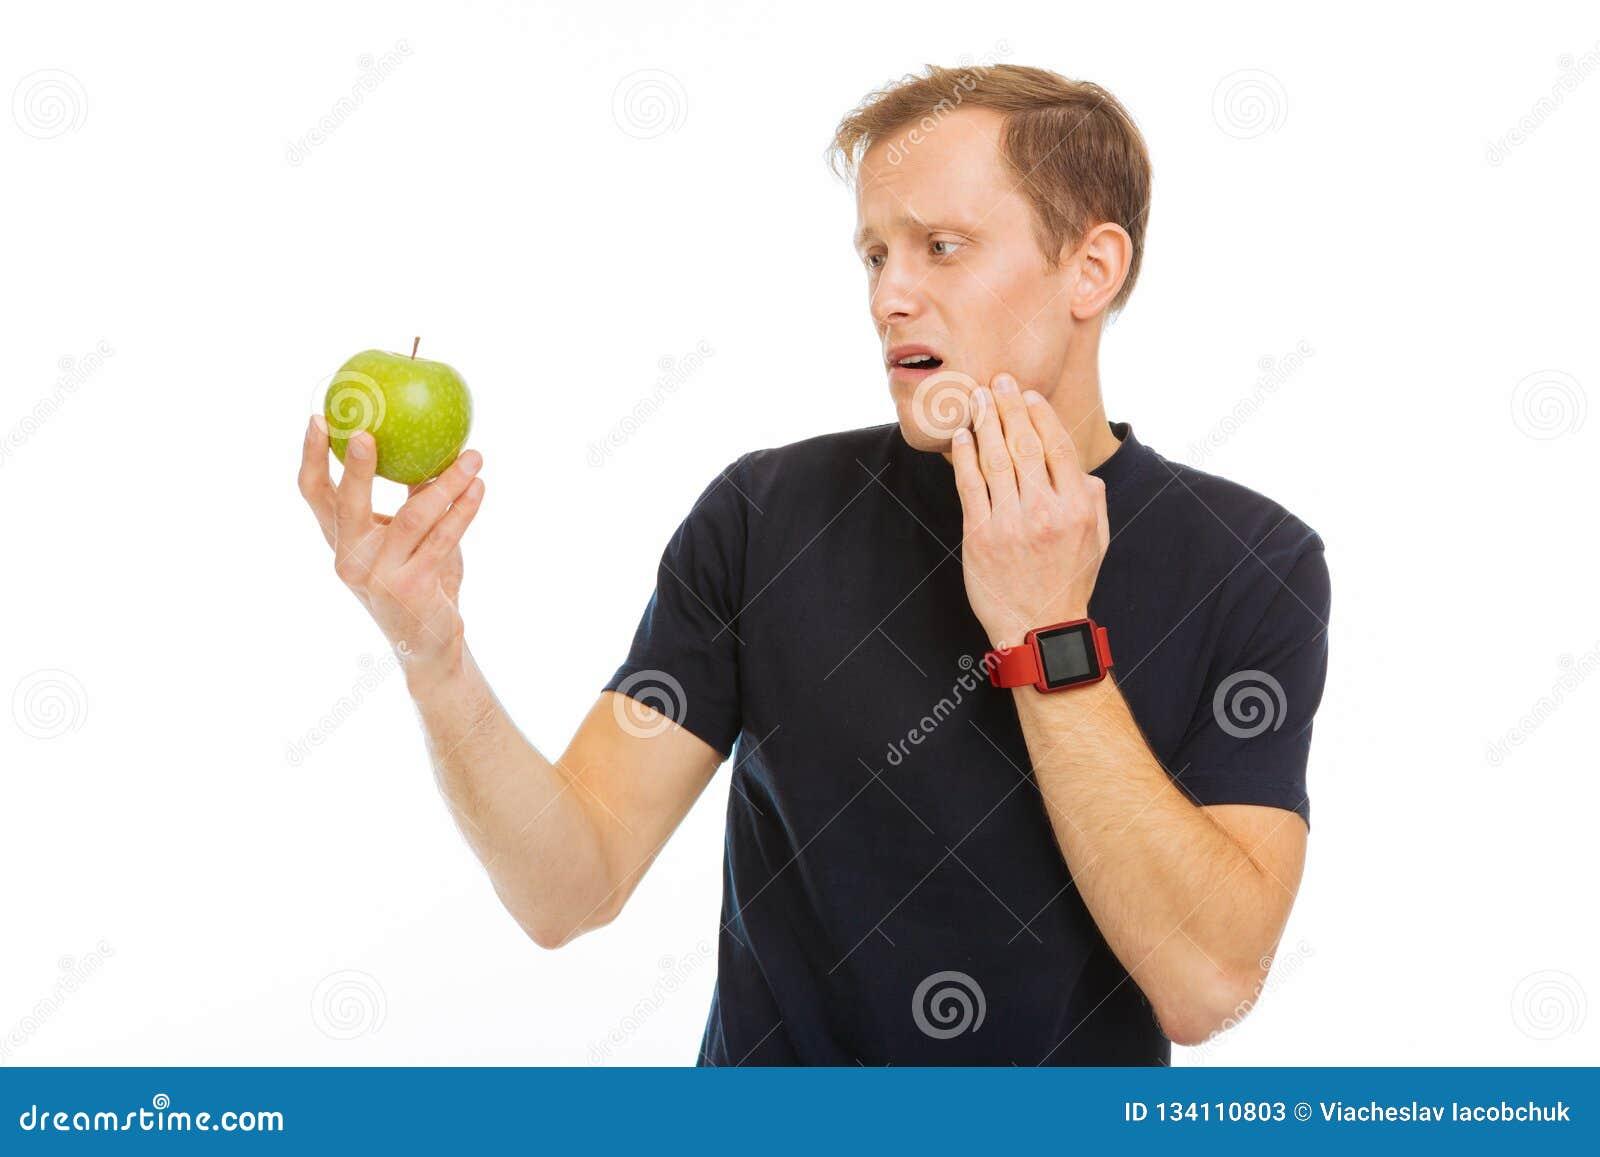 Uomo triste triste che esamina la mela verde